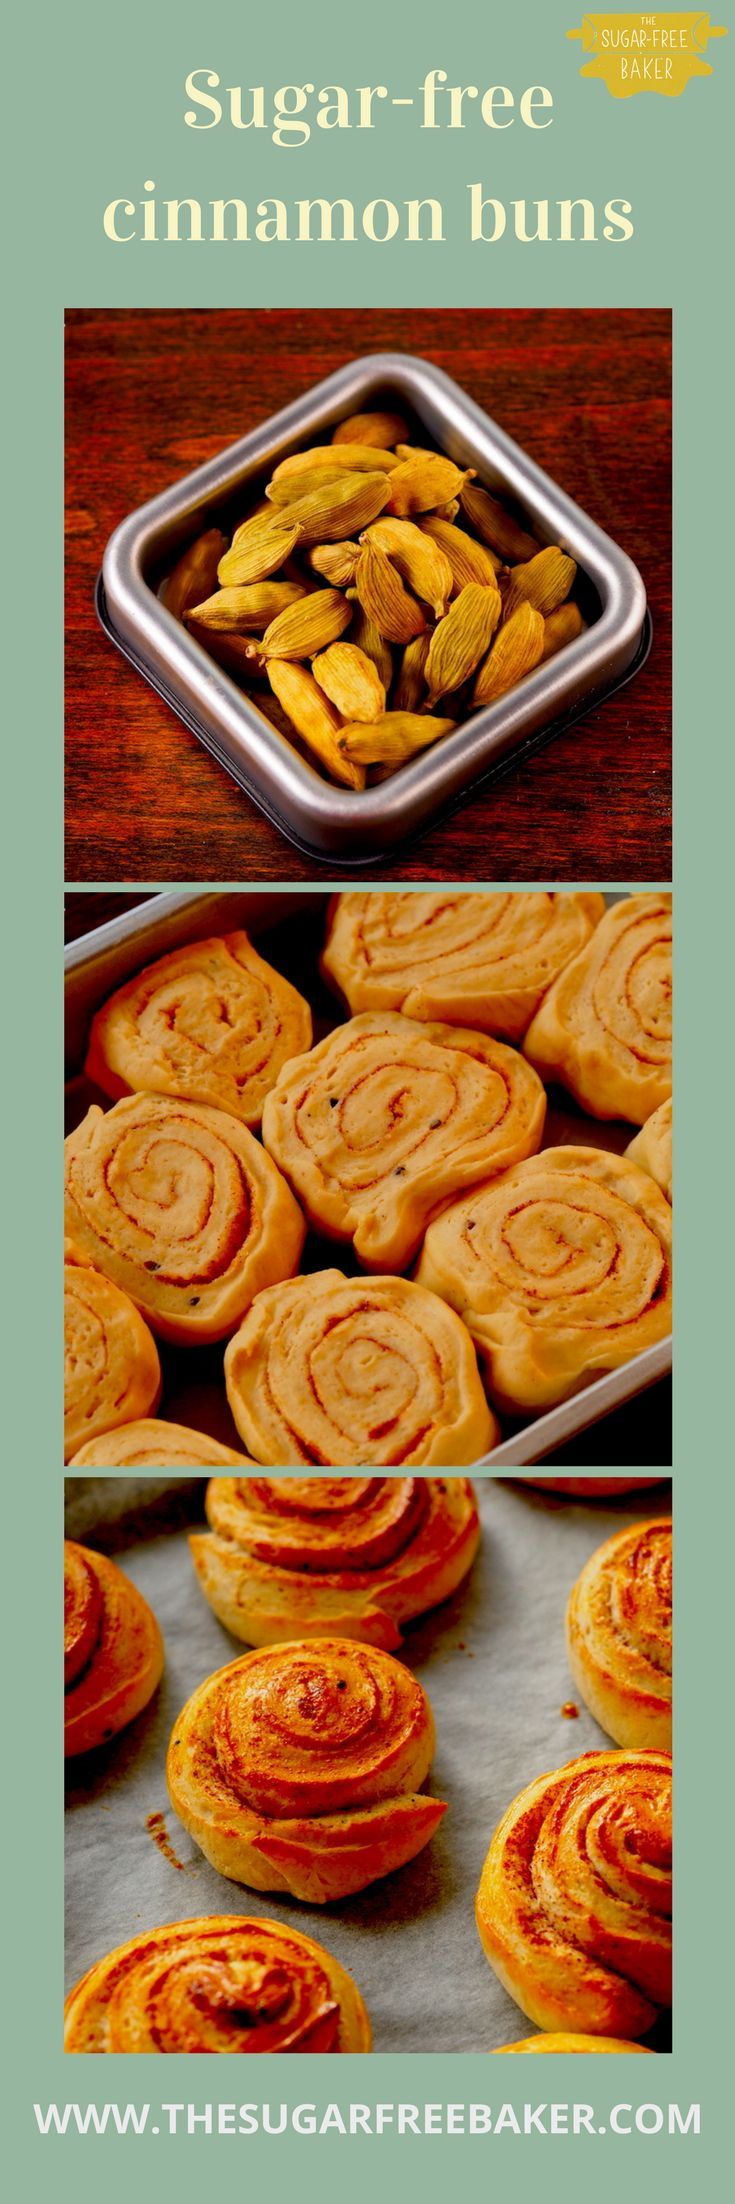 Delicious, homemade, sugar-free cinnamon buns - The Sugar-Free Baker | Sugar free baking | Sugar free dessert | Sugar free recipes | Sugar free diet | Cinnamon buns recipe | Homemade cinnamon buns